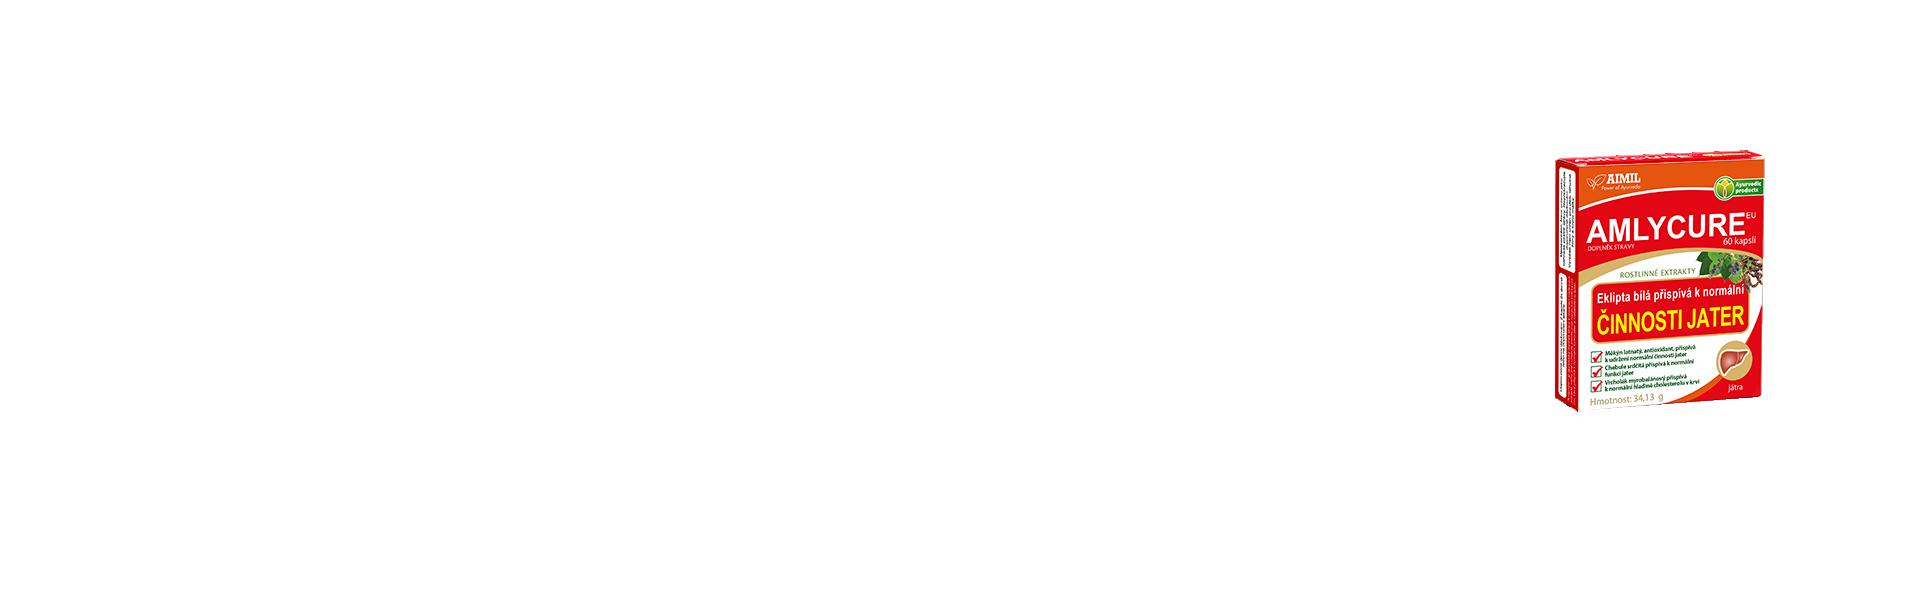 aimil-amlycure-product